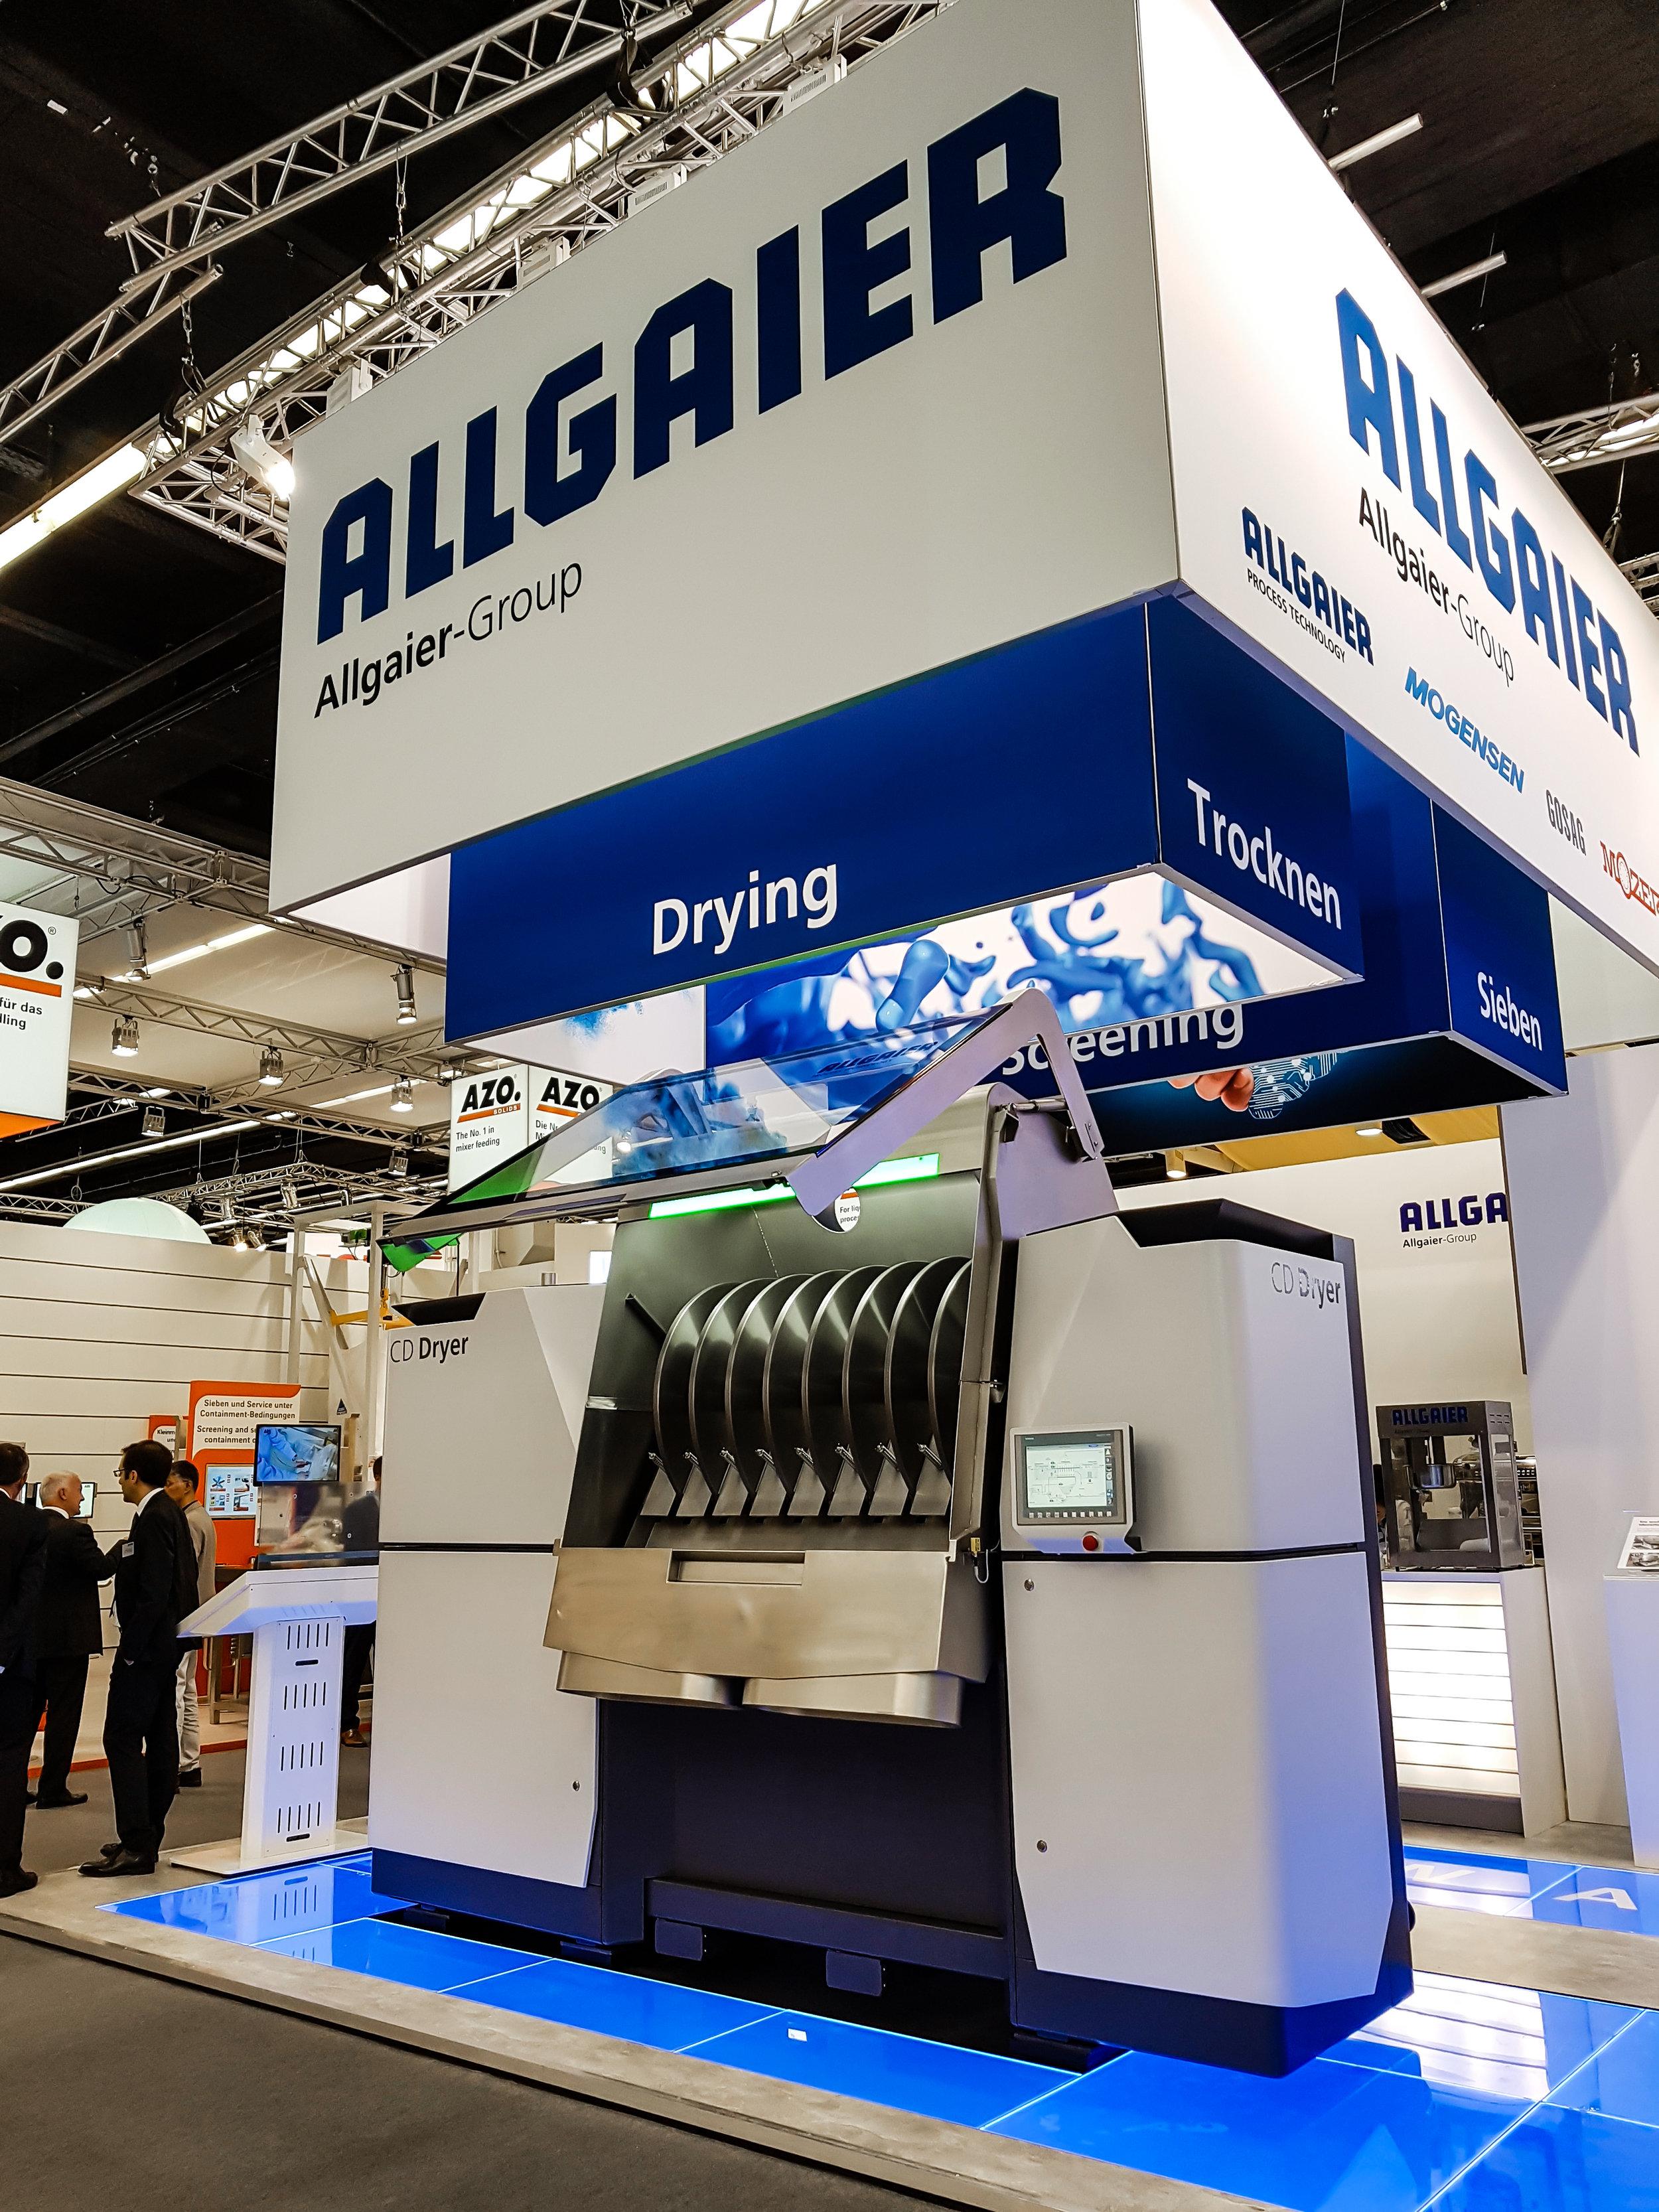 Allgaier CD Dryer at ACHEMA 2018 in Frankfurt am Main, Germany